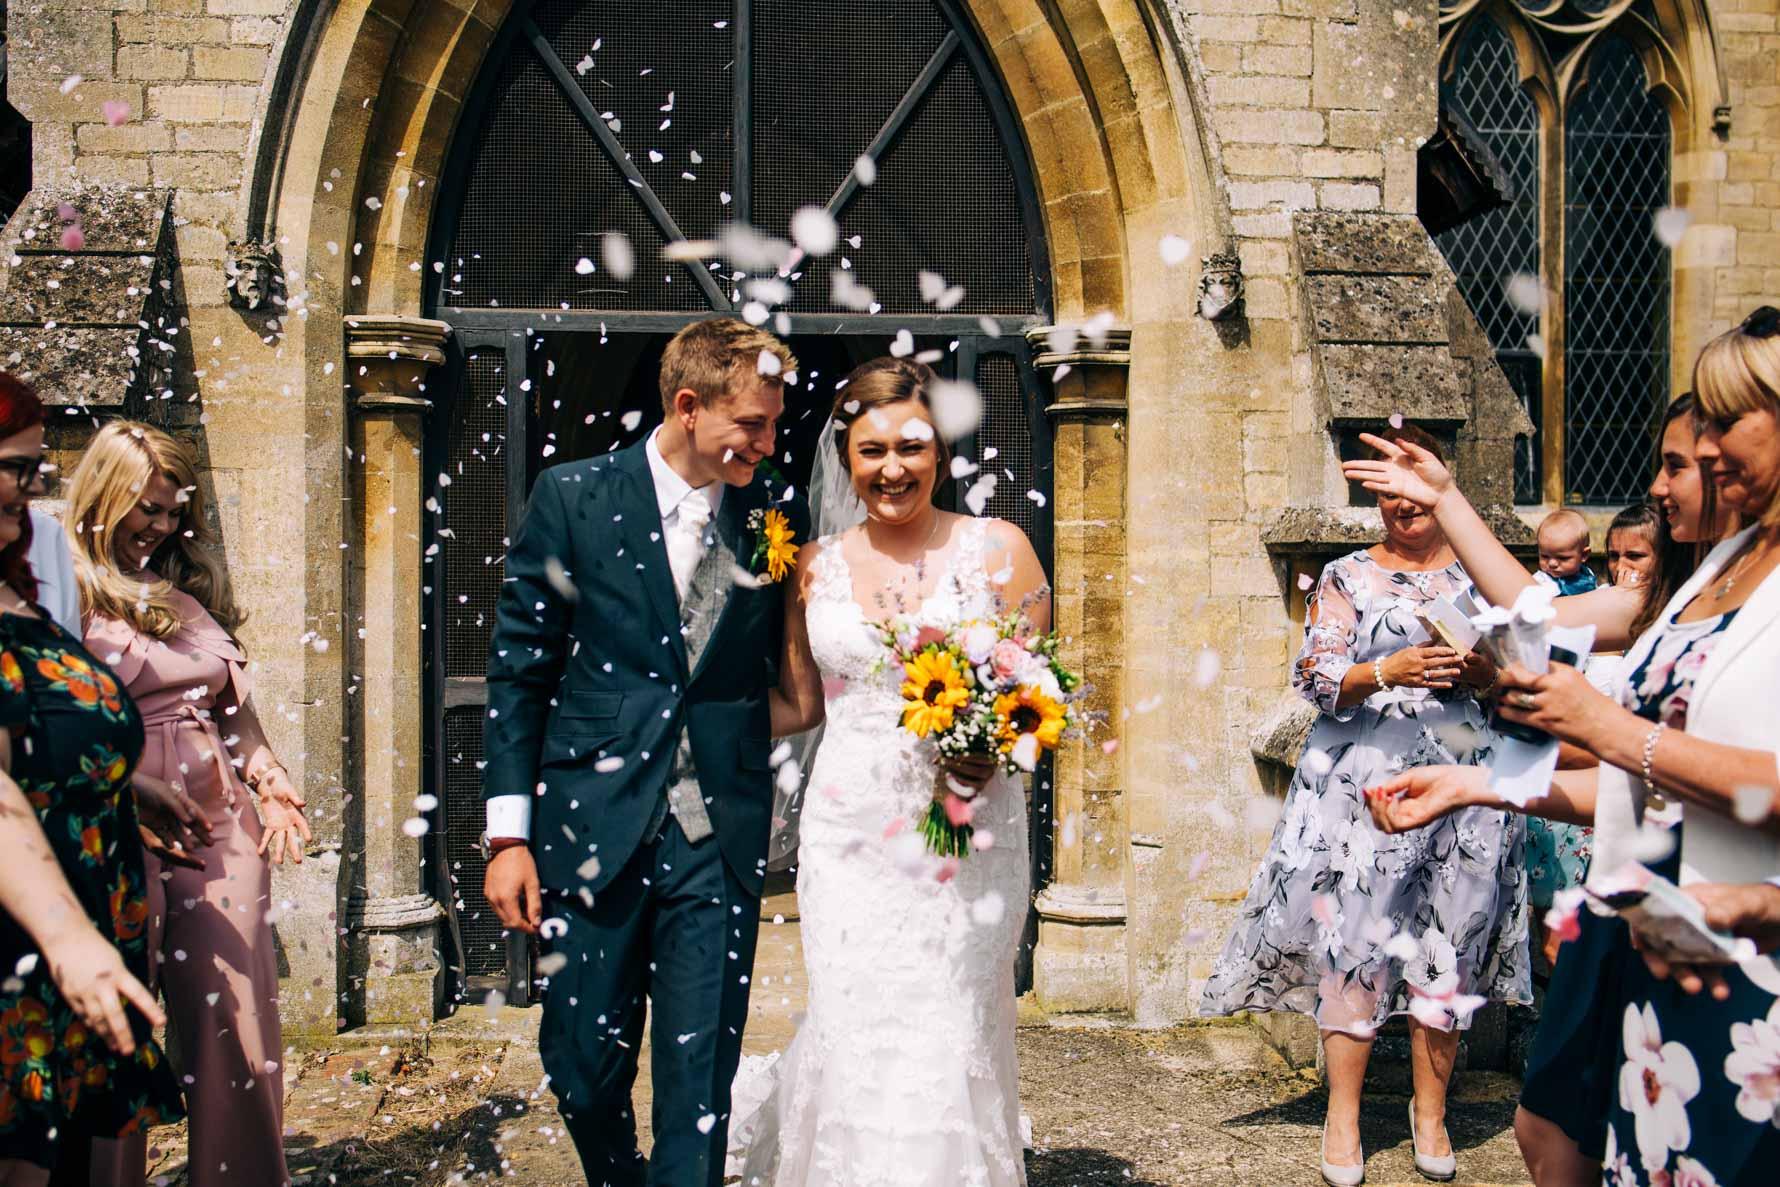 Bride and groom walking through confetti - Exton Park wedding photographer